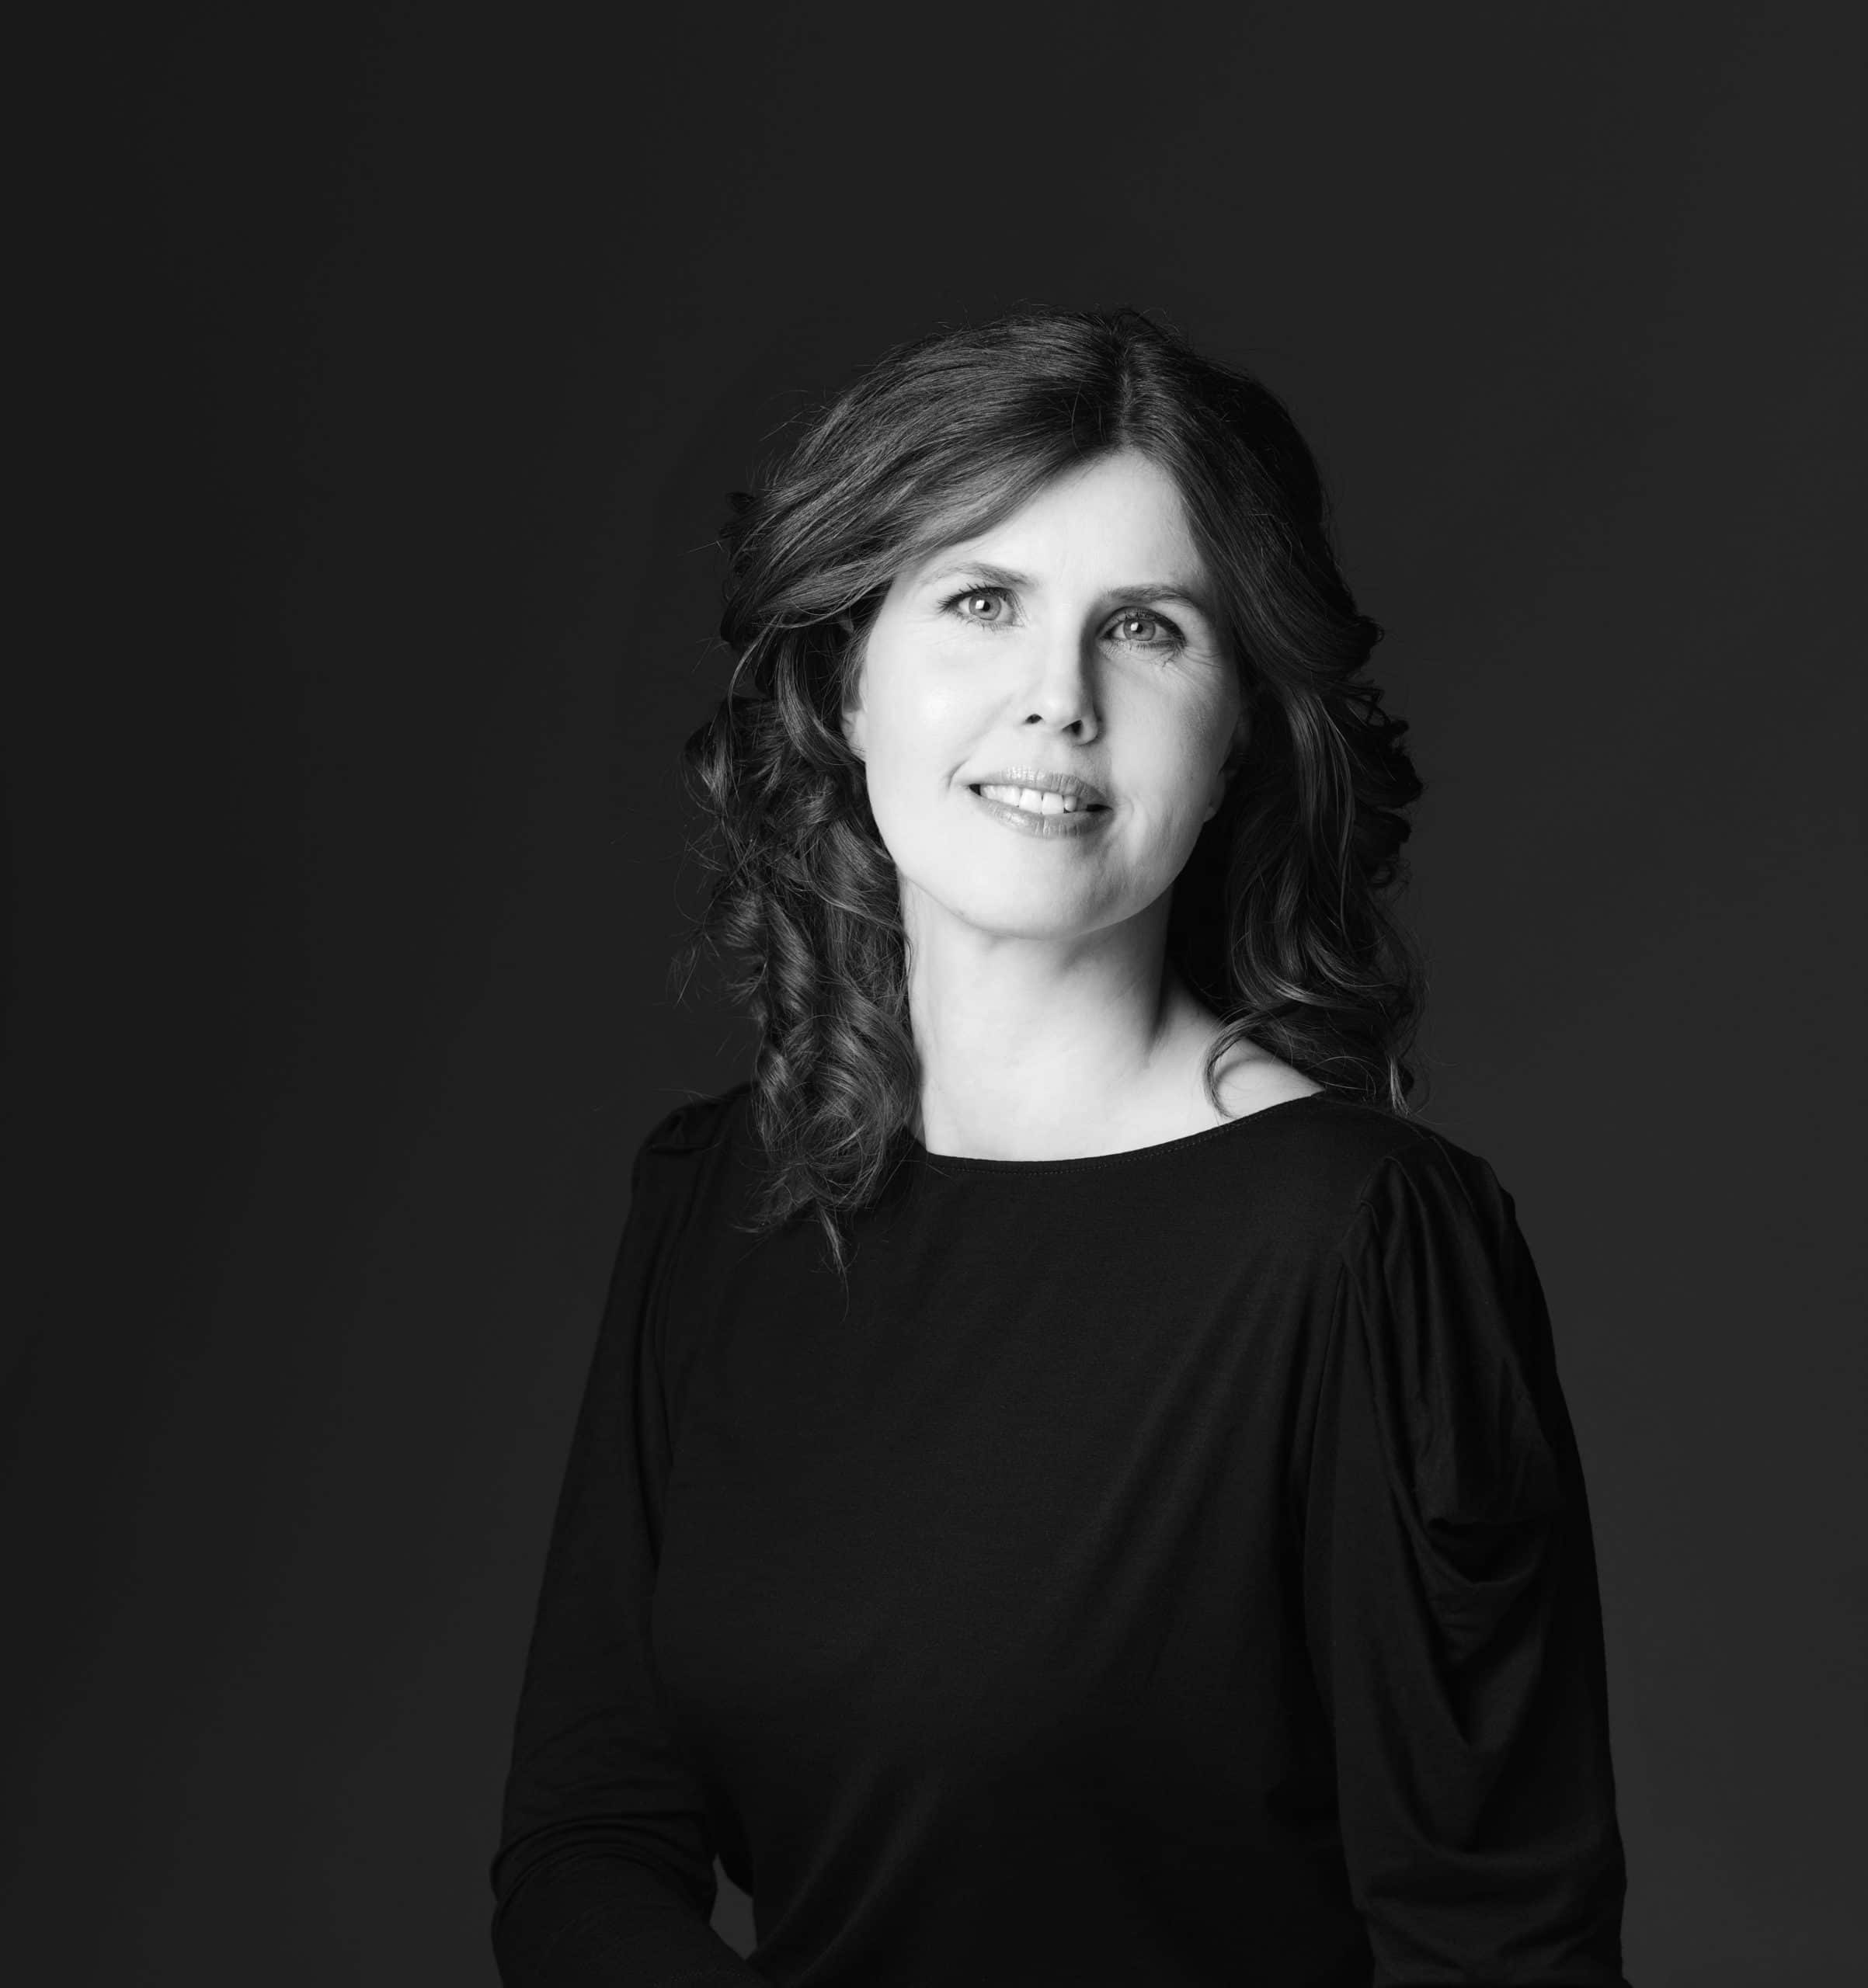 Lina Mørk